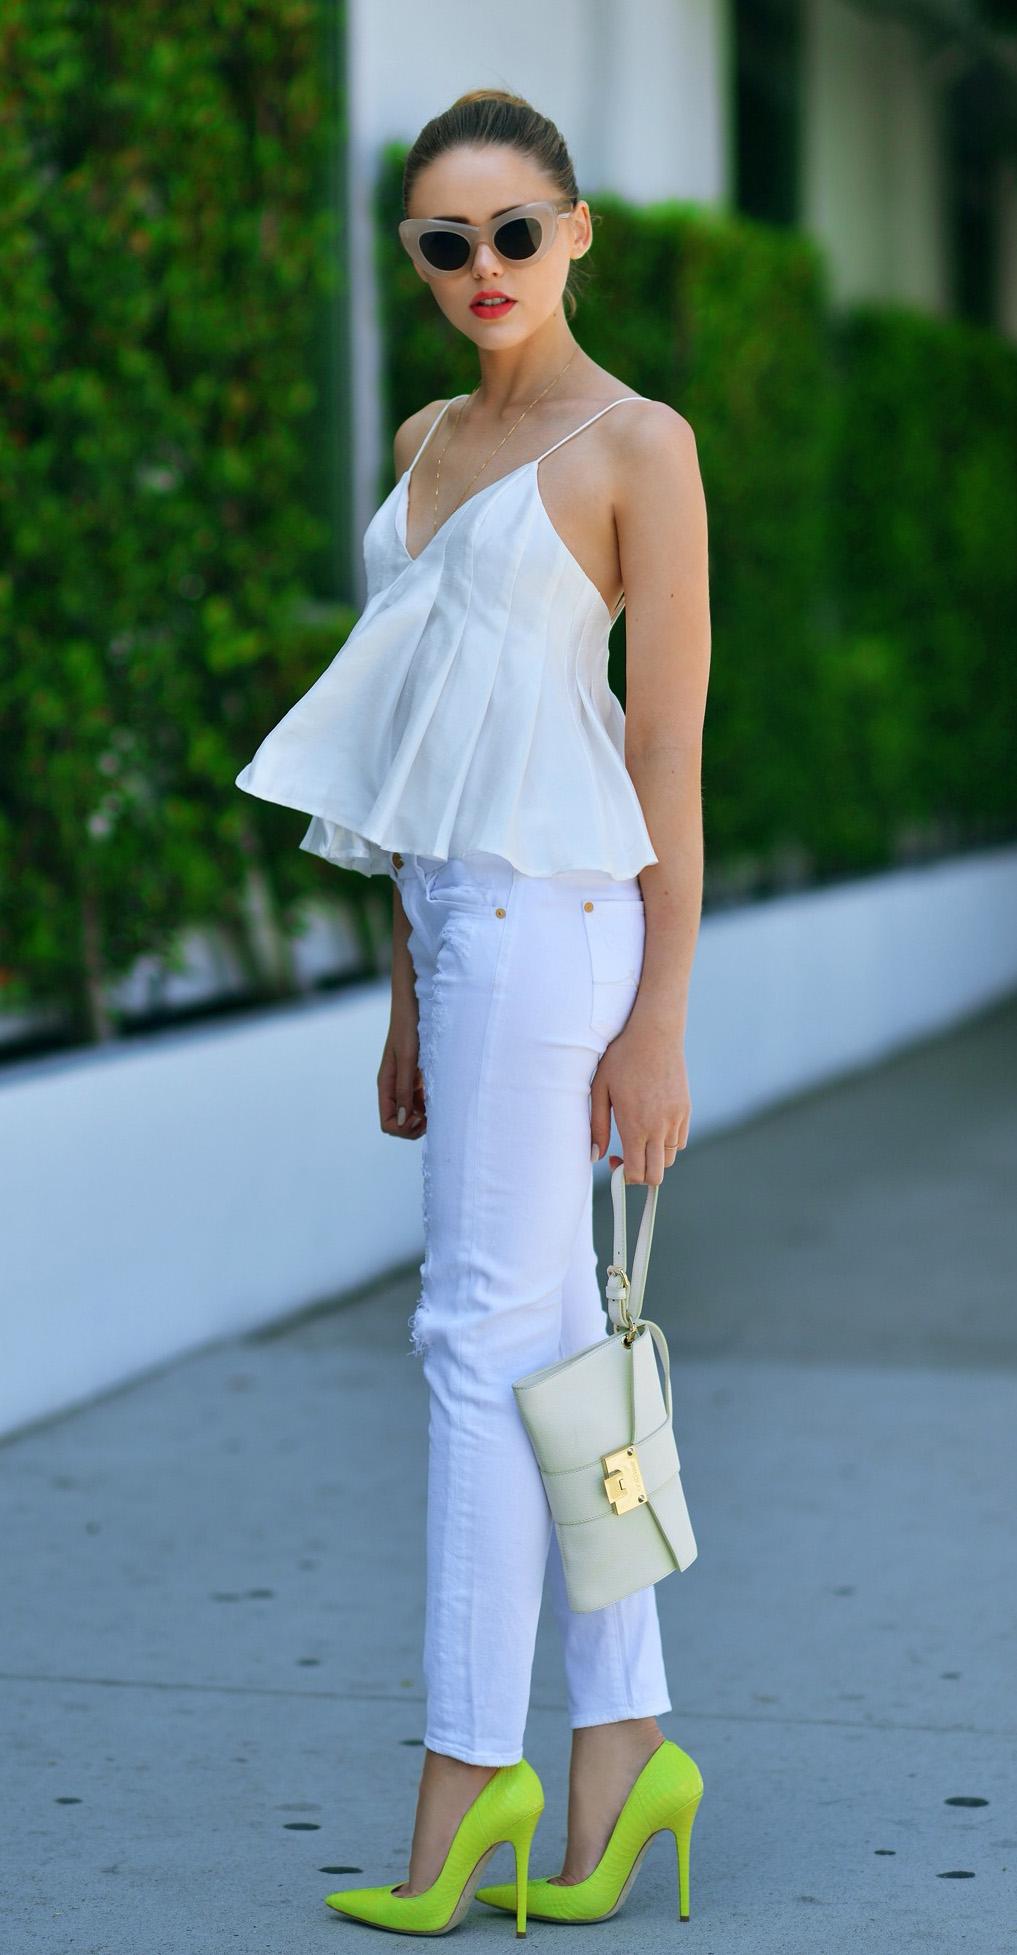 66bfd6bf70c white-skinny-jeans-white-cami-necklace-bun-sun-